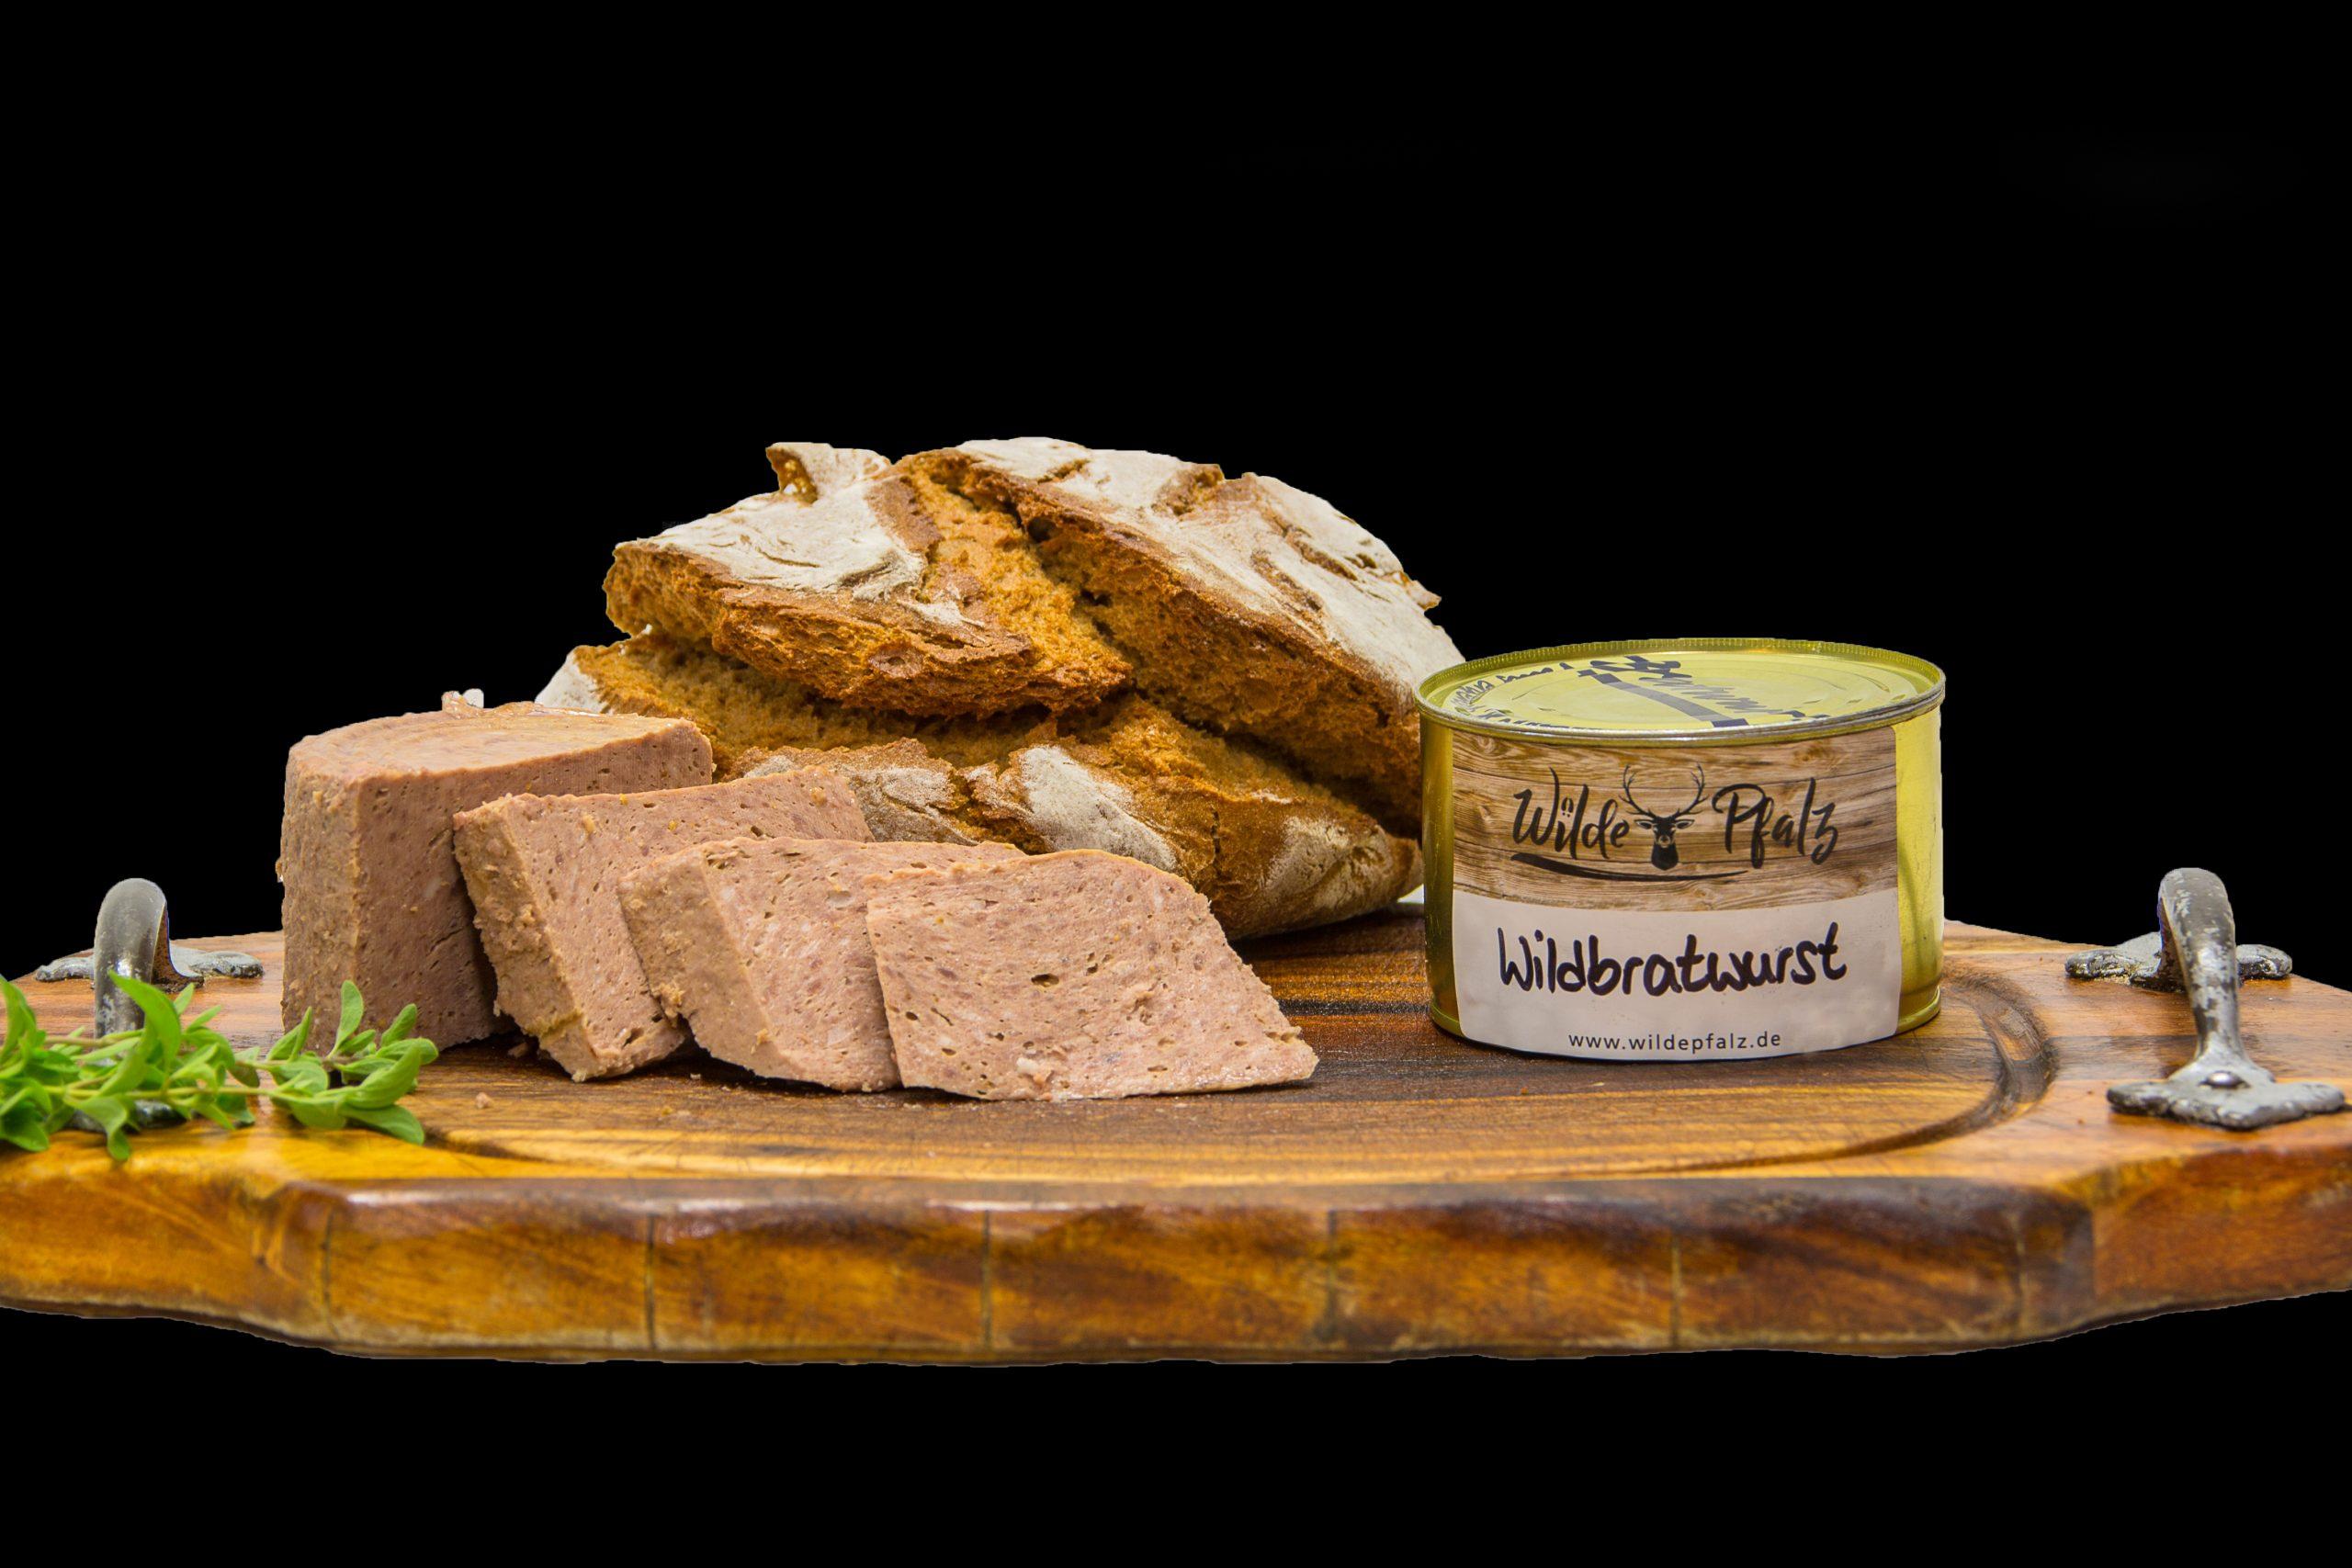 Wild-Bratwurst halbgrob